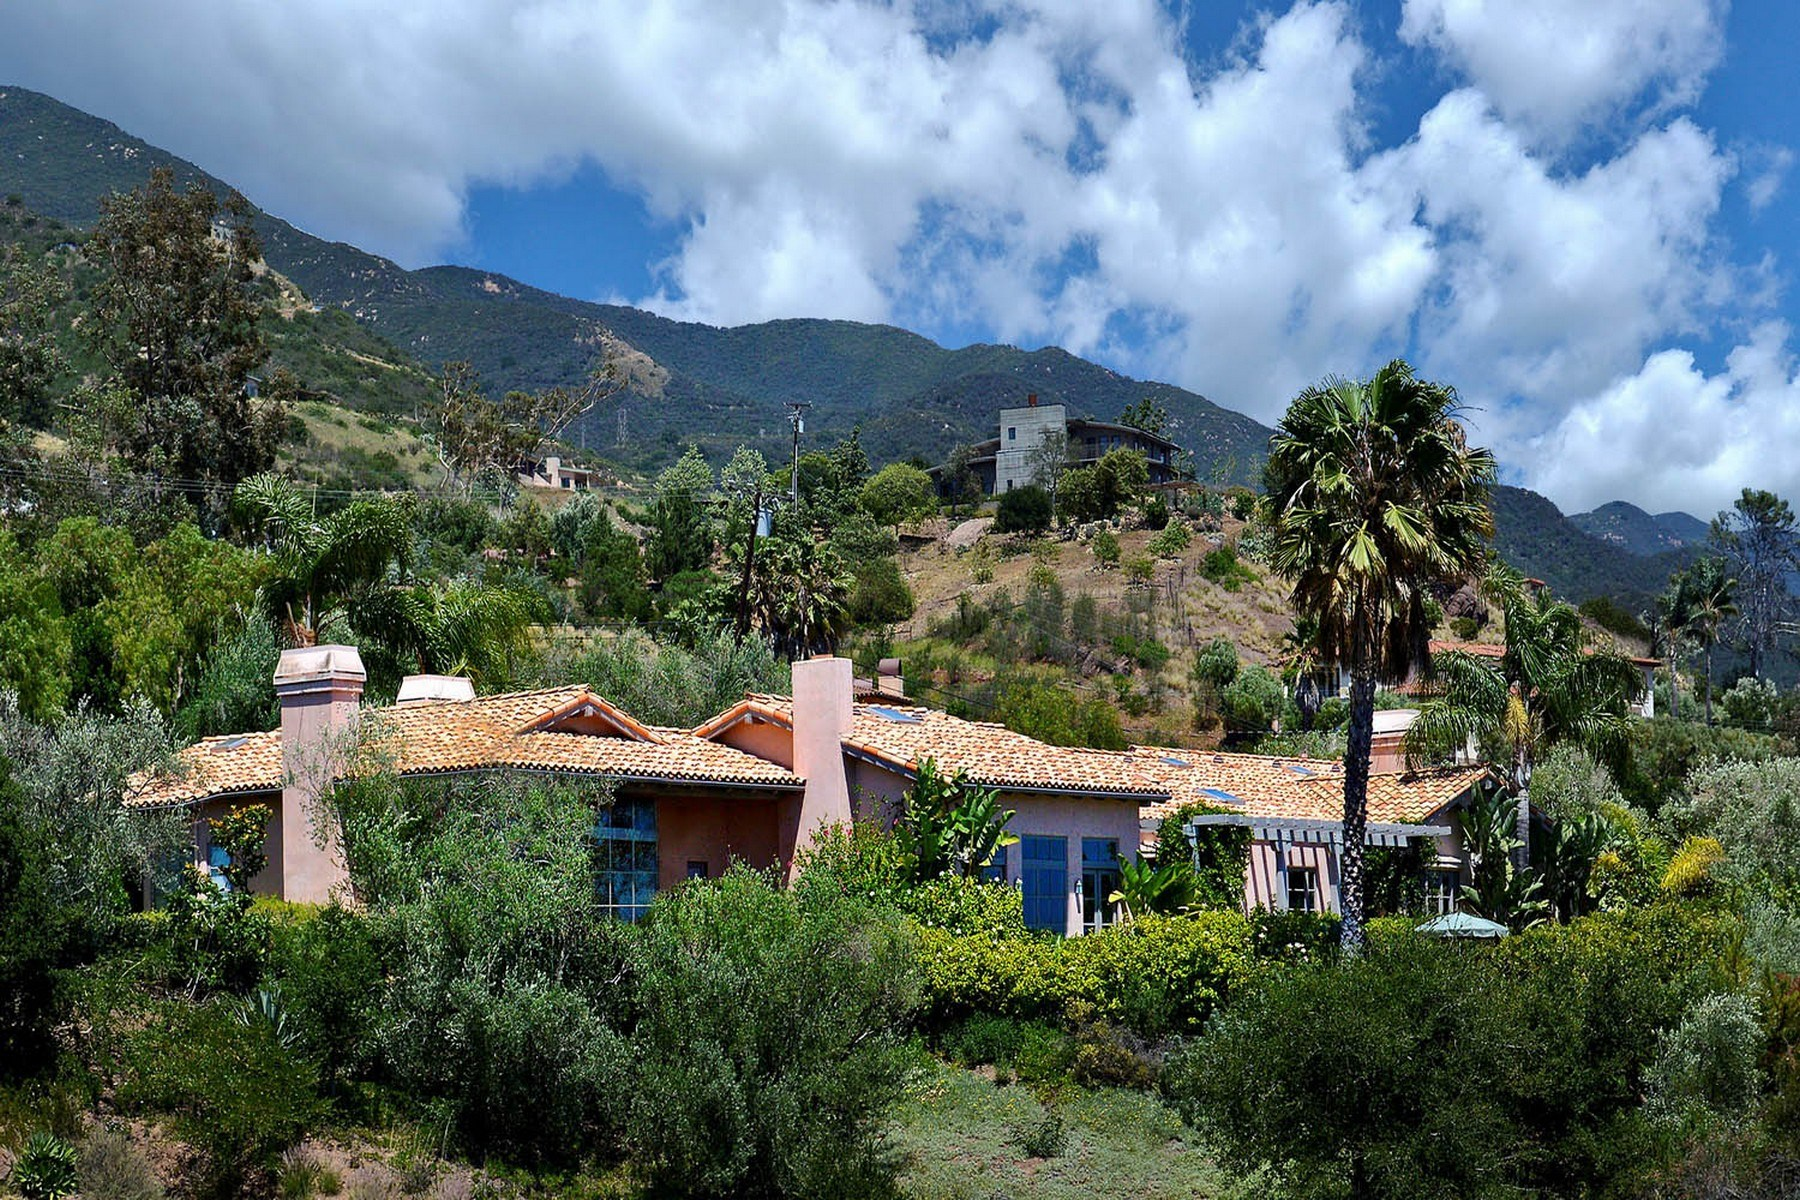 独户住宅 为 销售 在 Montecito Ocean View Estate 187 East Mountain Drive Montecito - Upper Village, 圣巴巴拉市, 加利福尼亚州, 93108 美国